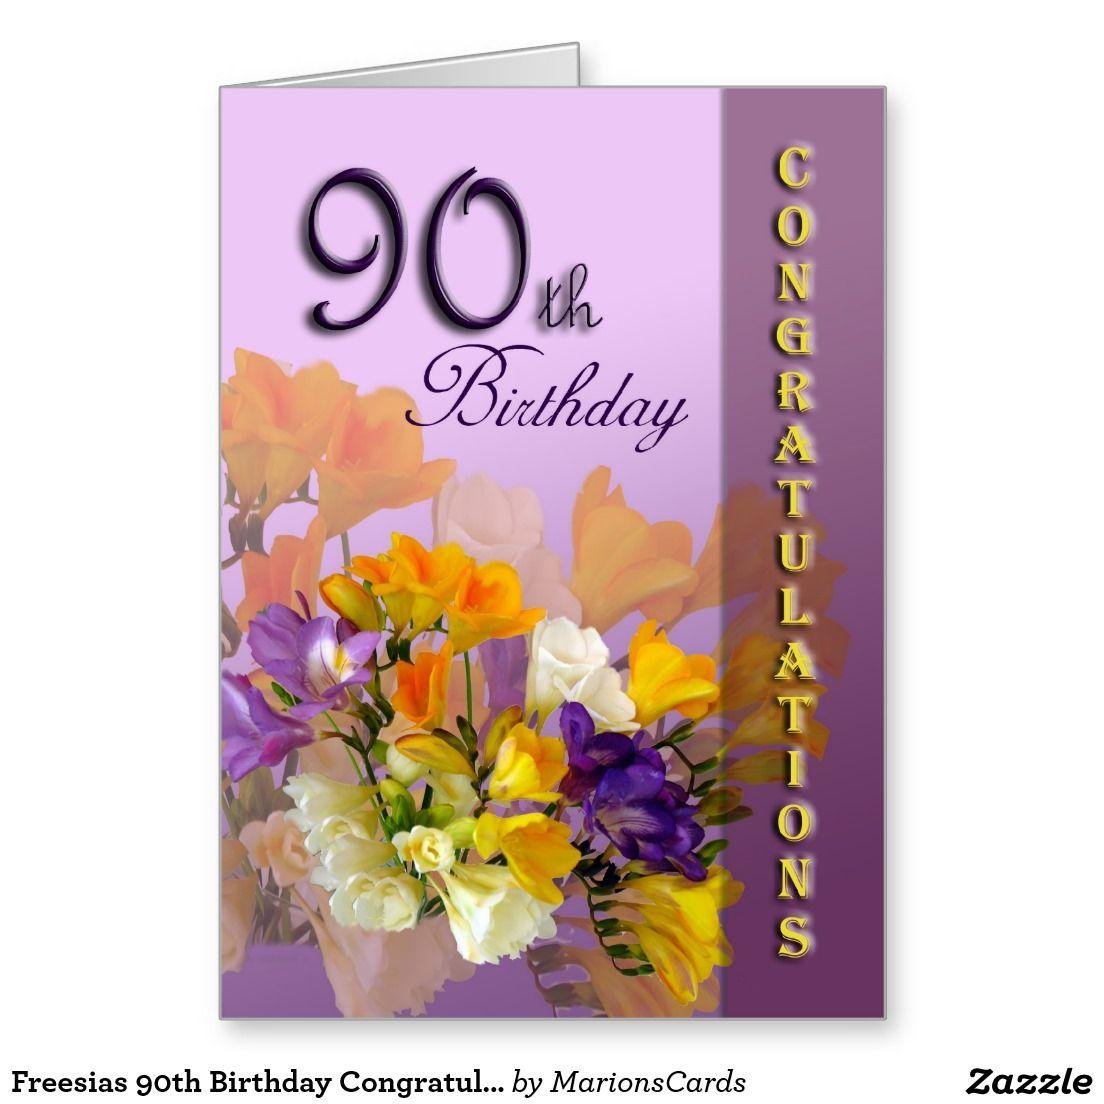 Freesias 90th Birthday Congratulations Card